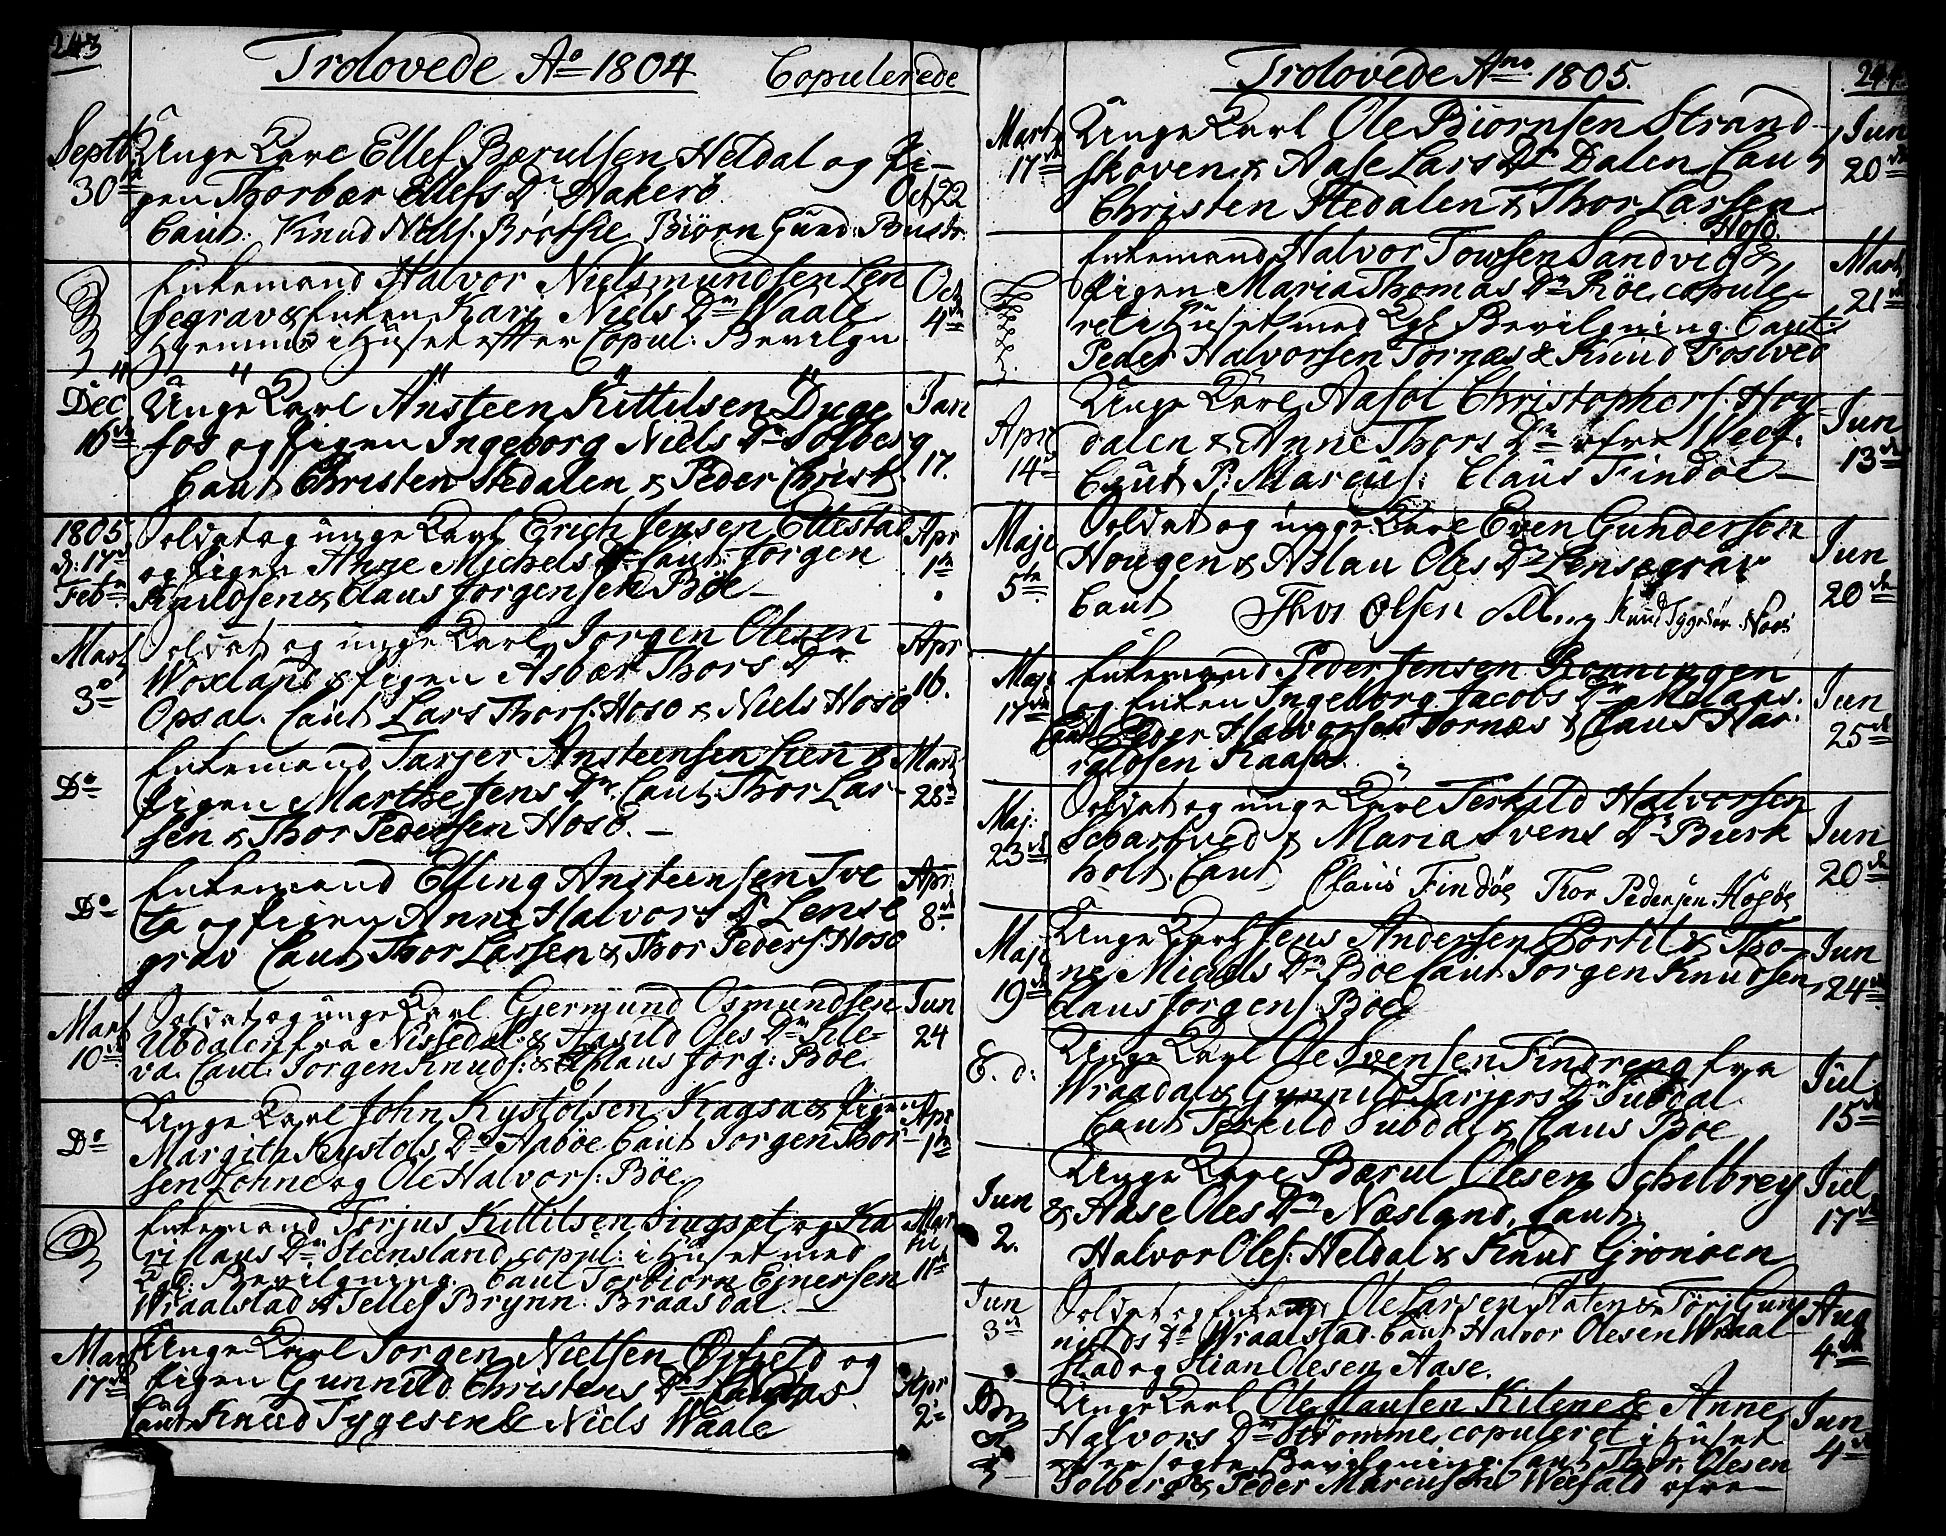 SAKO, Drangedal kirkebøker, F/Fa/L0003: Ministerialbok nr. 3, 1768-1814, s. 243-244